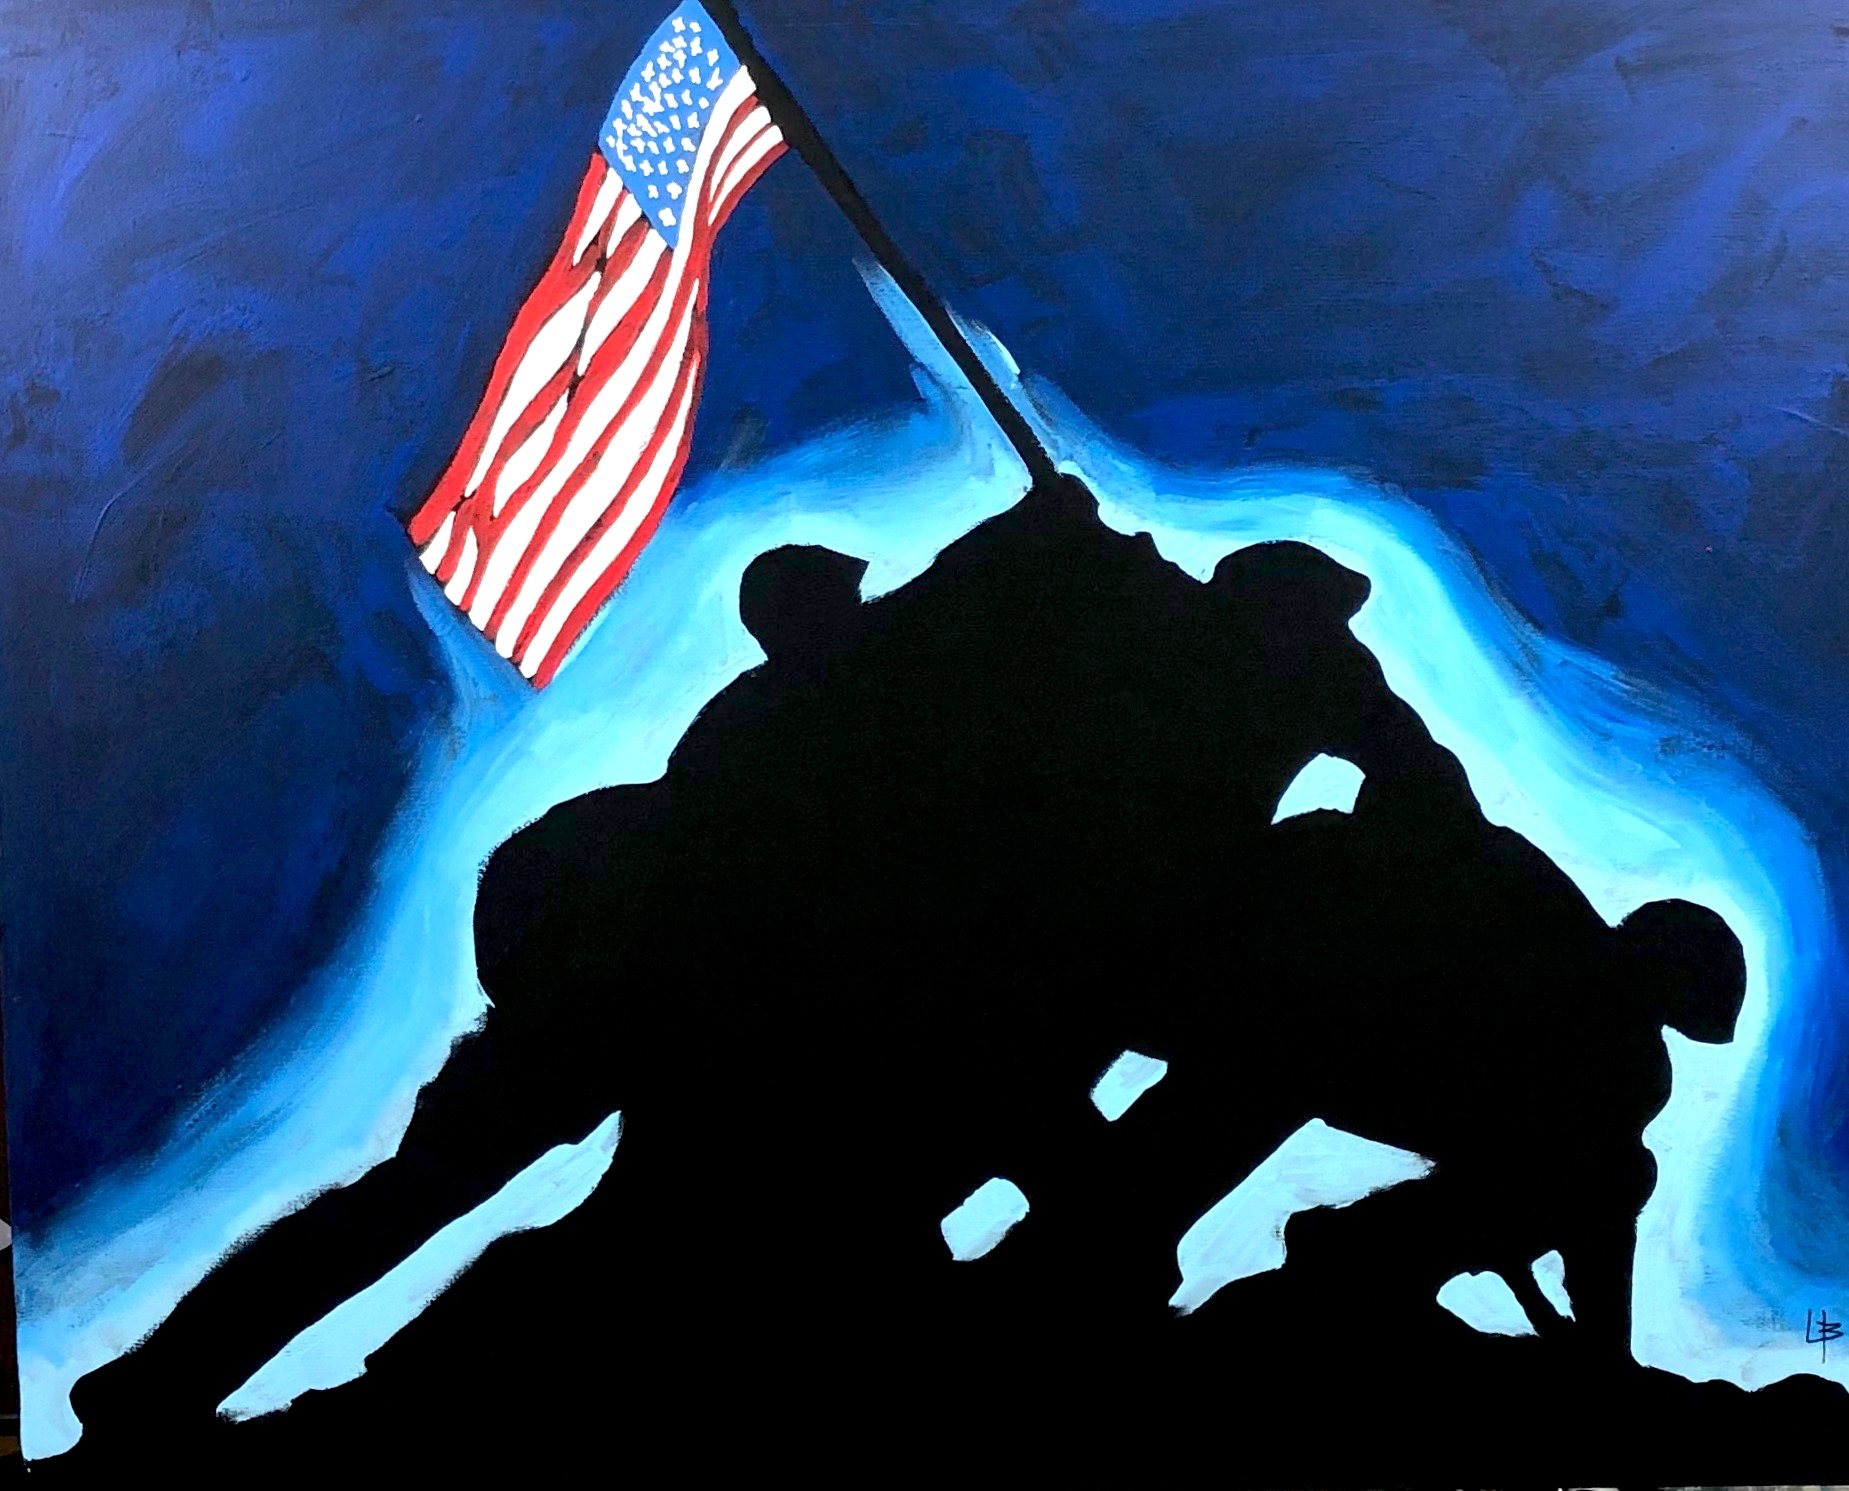 Victory-flag-raise-iwo-jima-soldiers